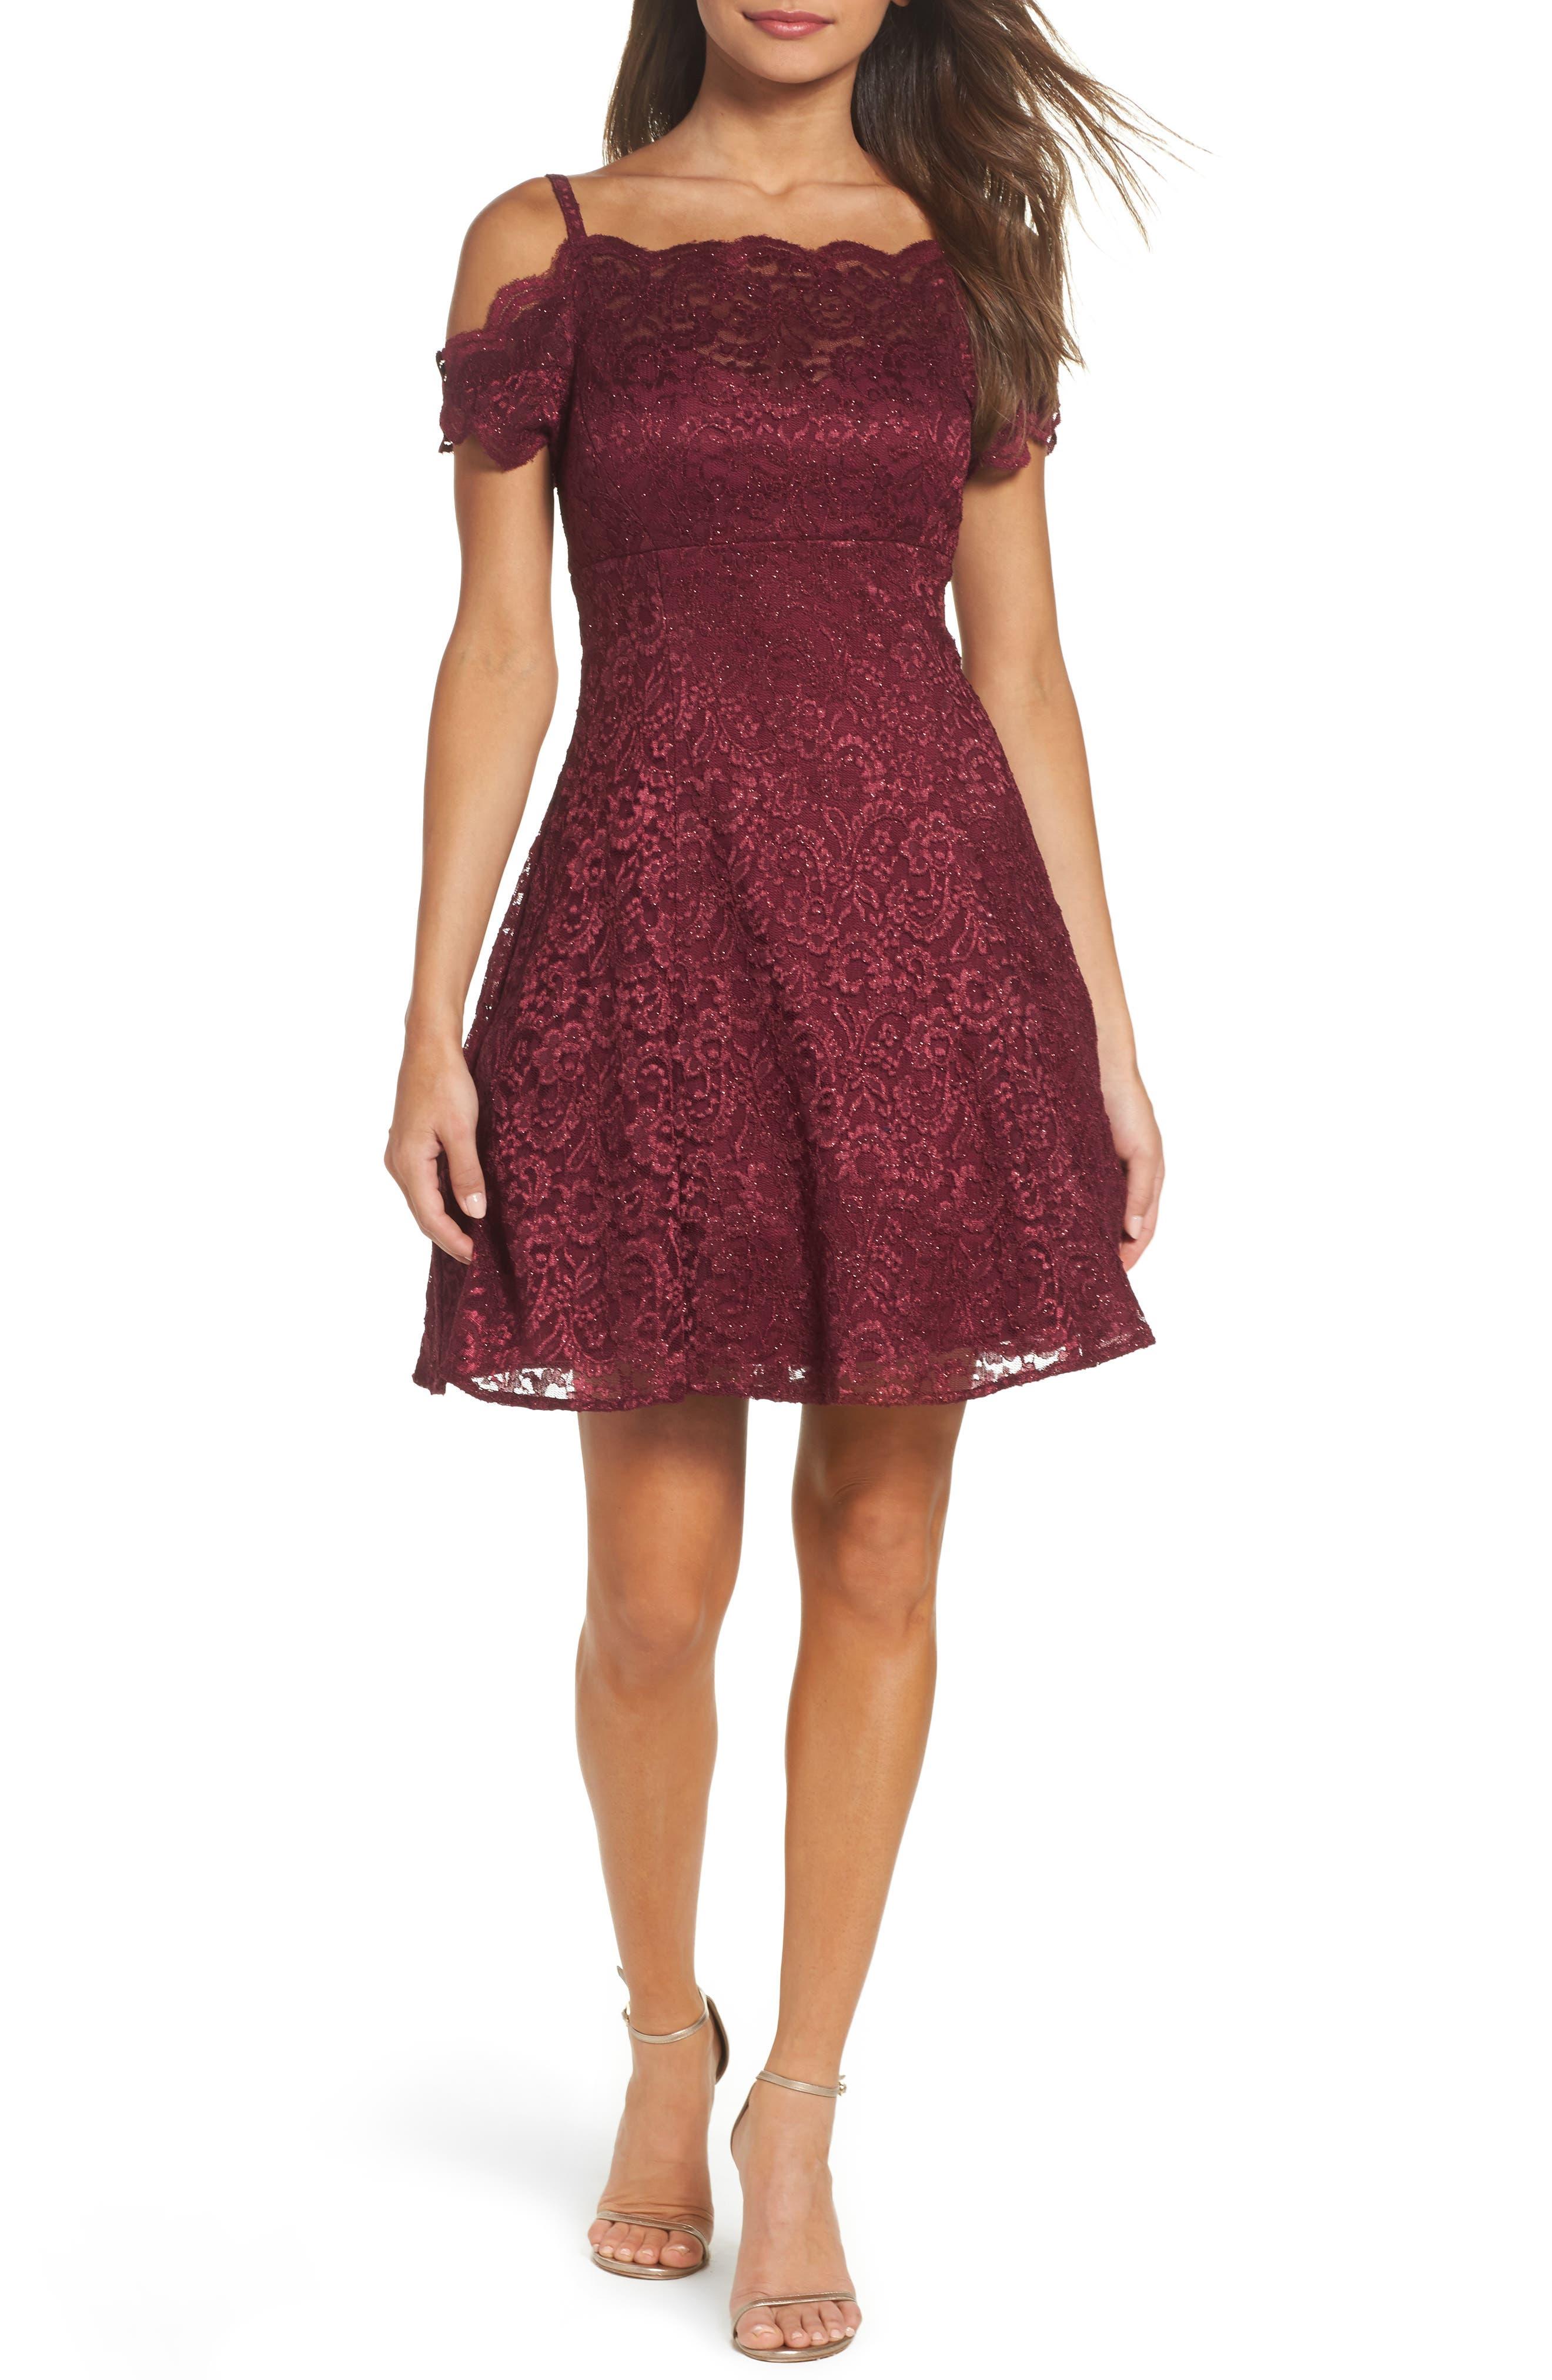 Morgan & Co. Cold Shoulder Glitter Lace Fit & Flare Dress, /2 - Burgundy